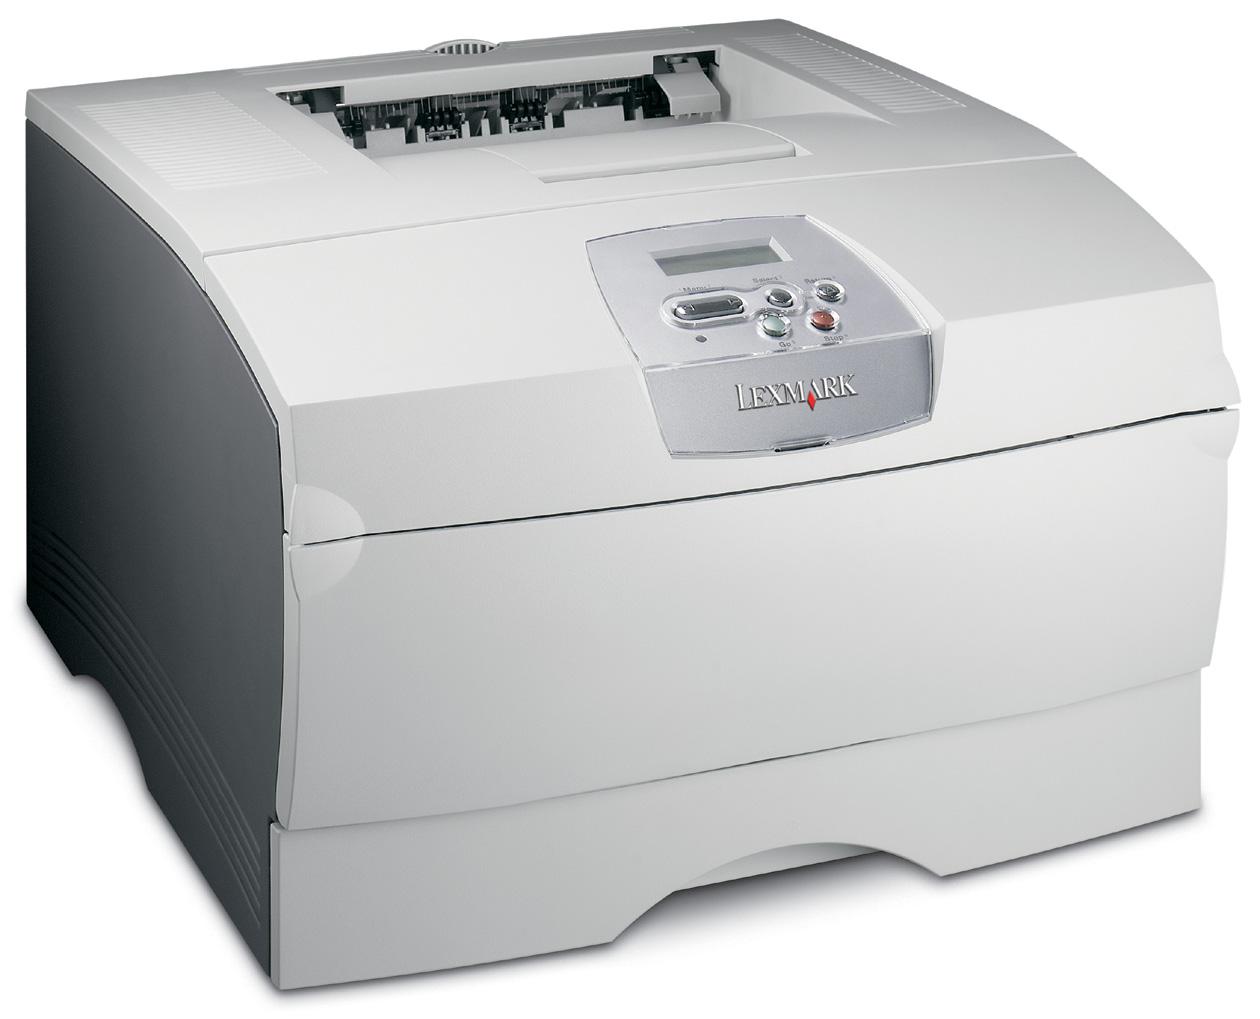 Lexmark m410